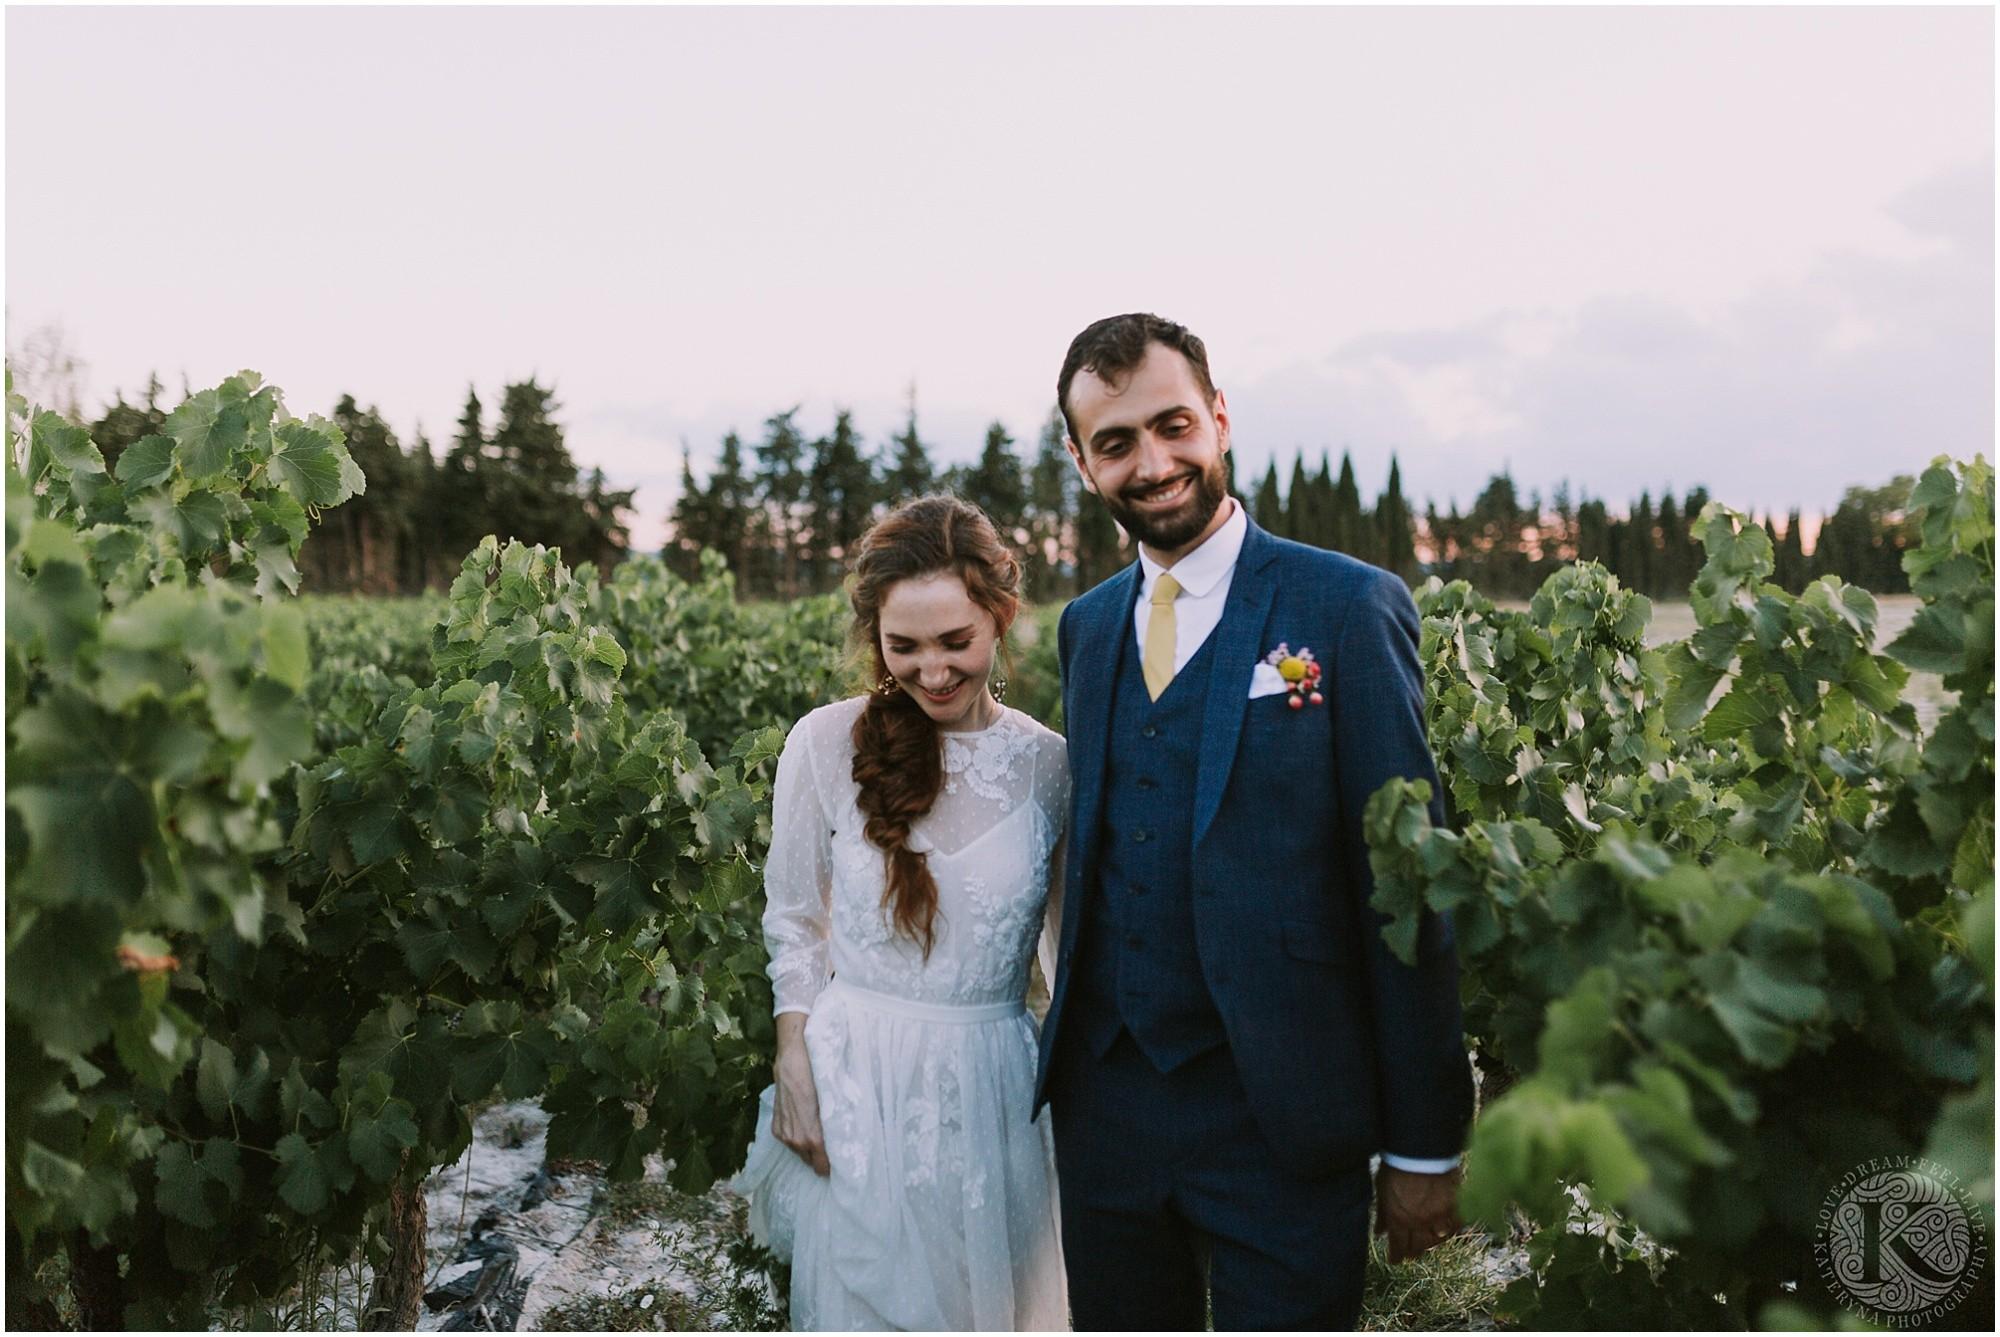 Kateryna-photos-photographe-mariage-vaucluse-provence-avignon-ferme-st-hugues_0083.jpg